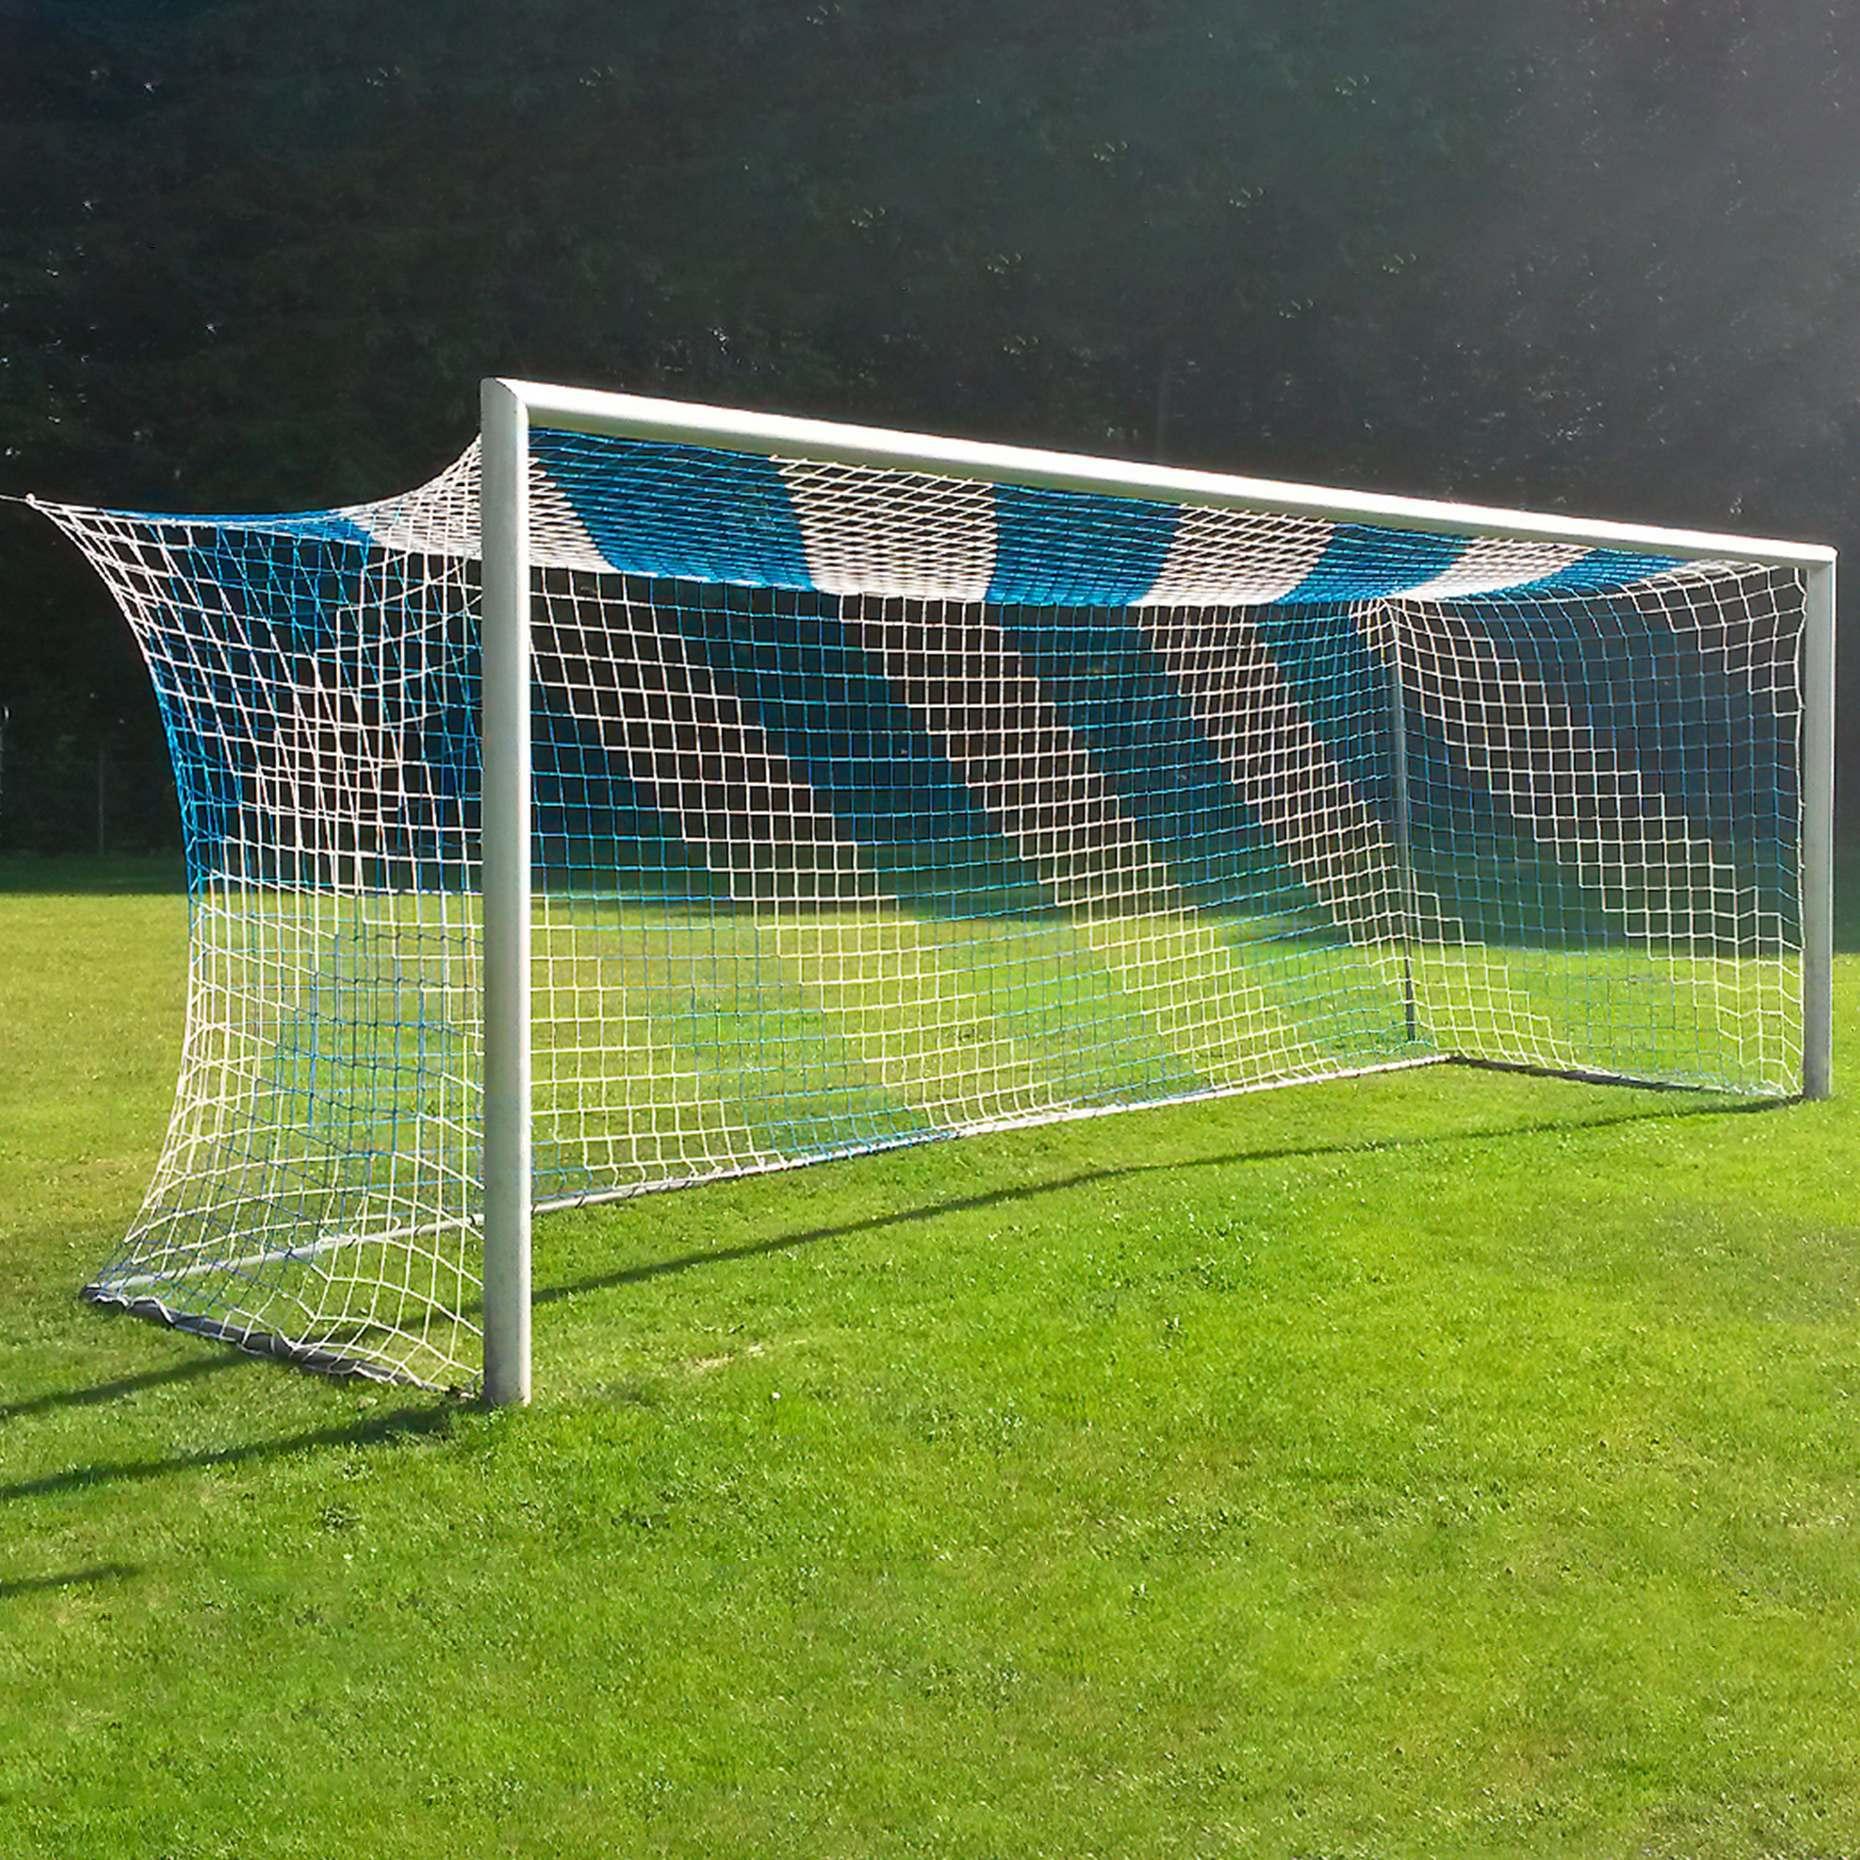 5mm Striped Stadium Box Soccer Nets 3x Colors Forza Goal